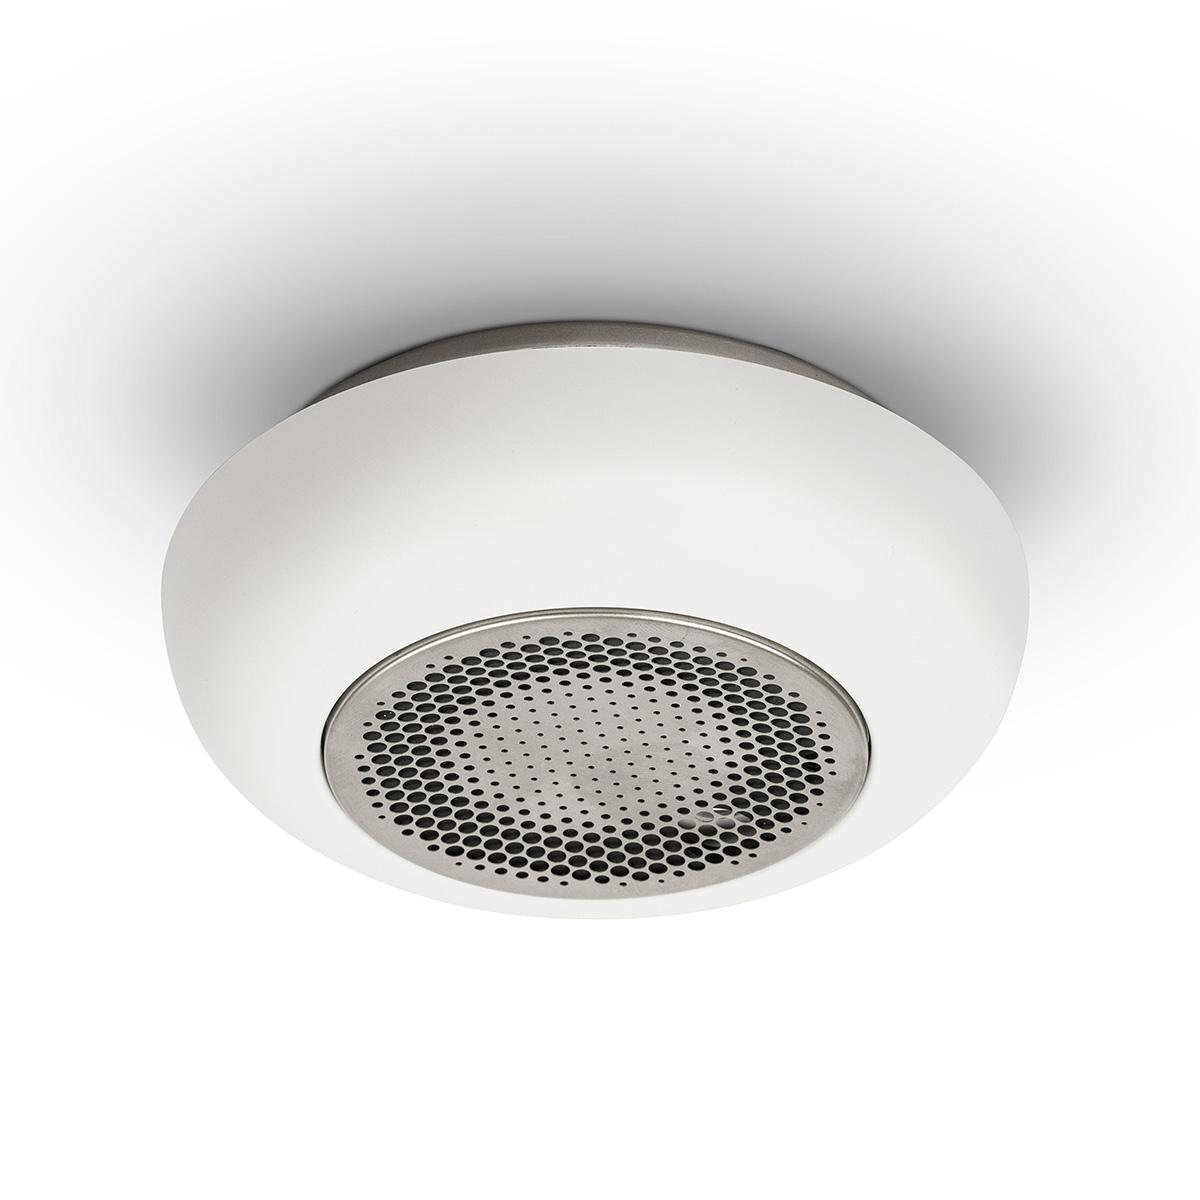 Firephant røgalarm - Hvid/stål